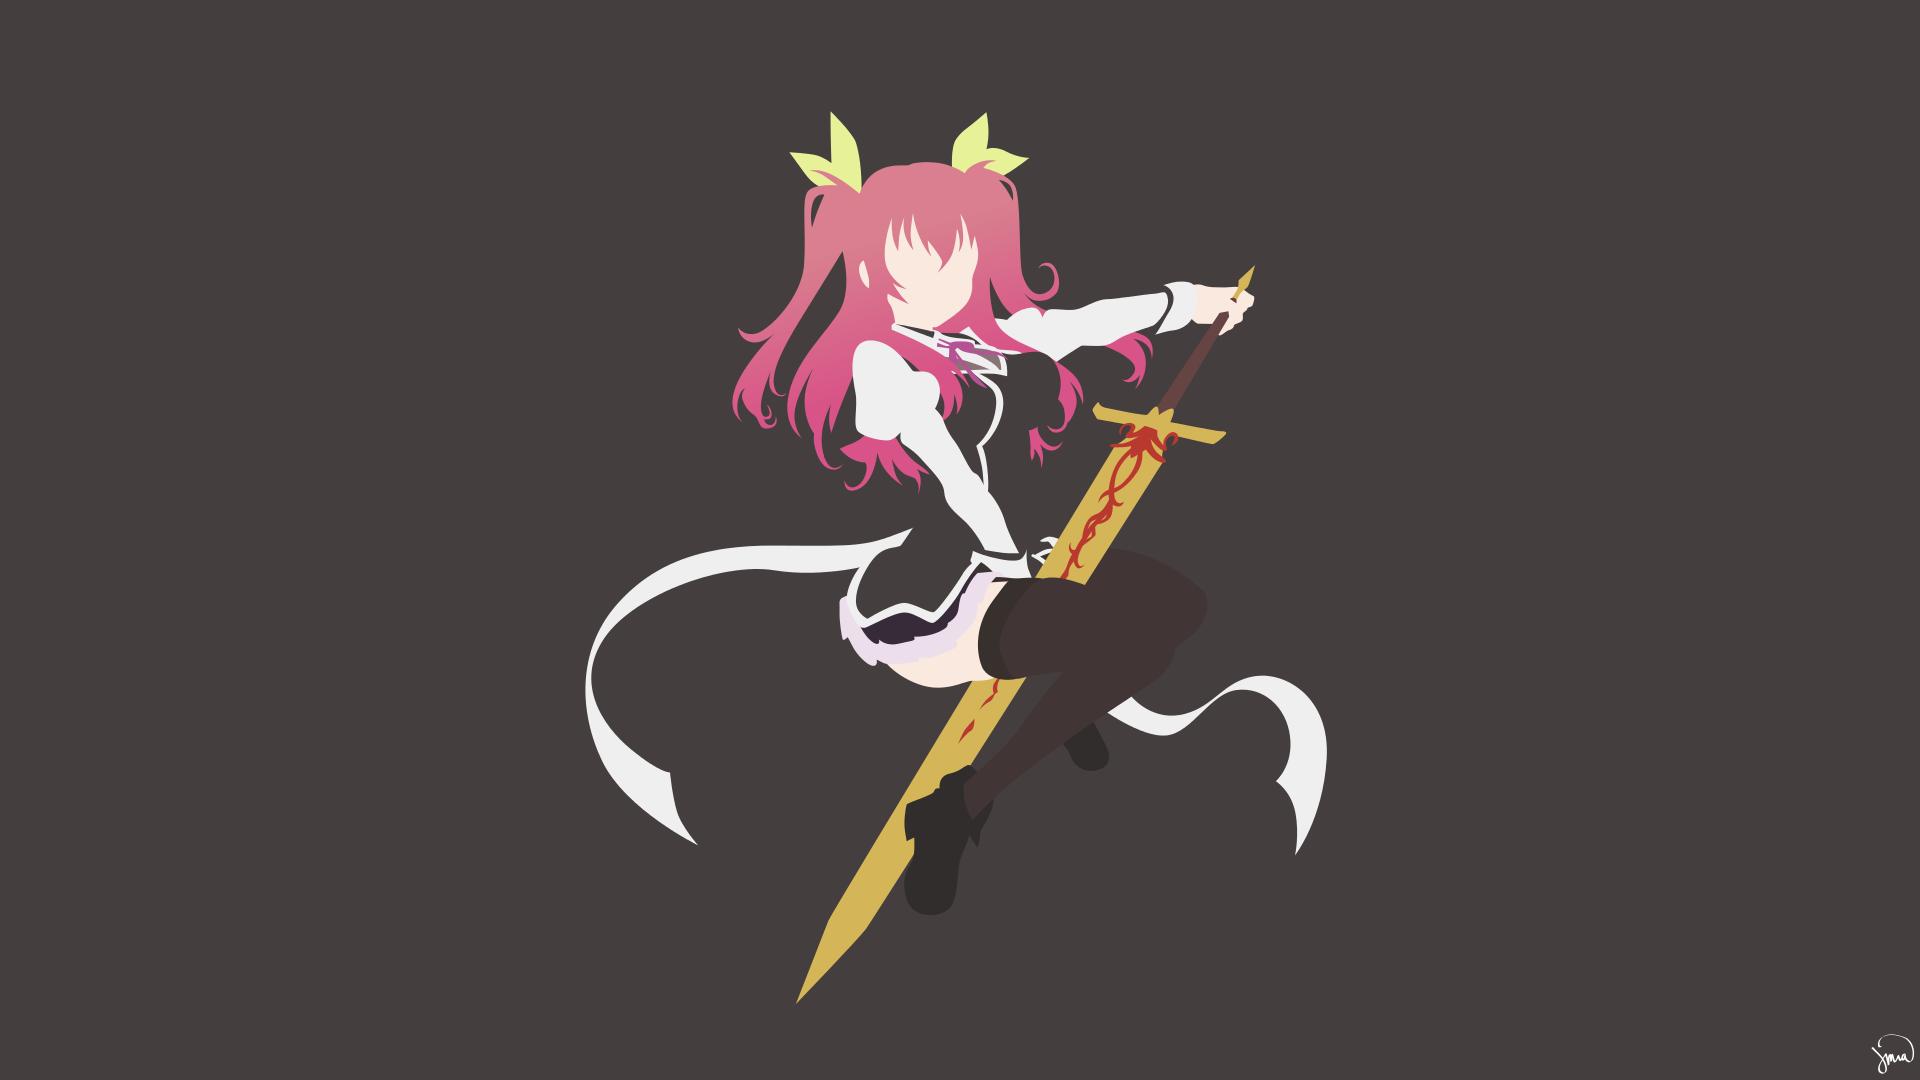 Anime-Chivalry-Of-A-Failed-Knight-Stella-Vermillion-wallpaper-wp5403275